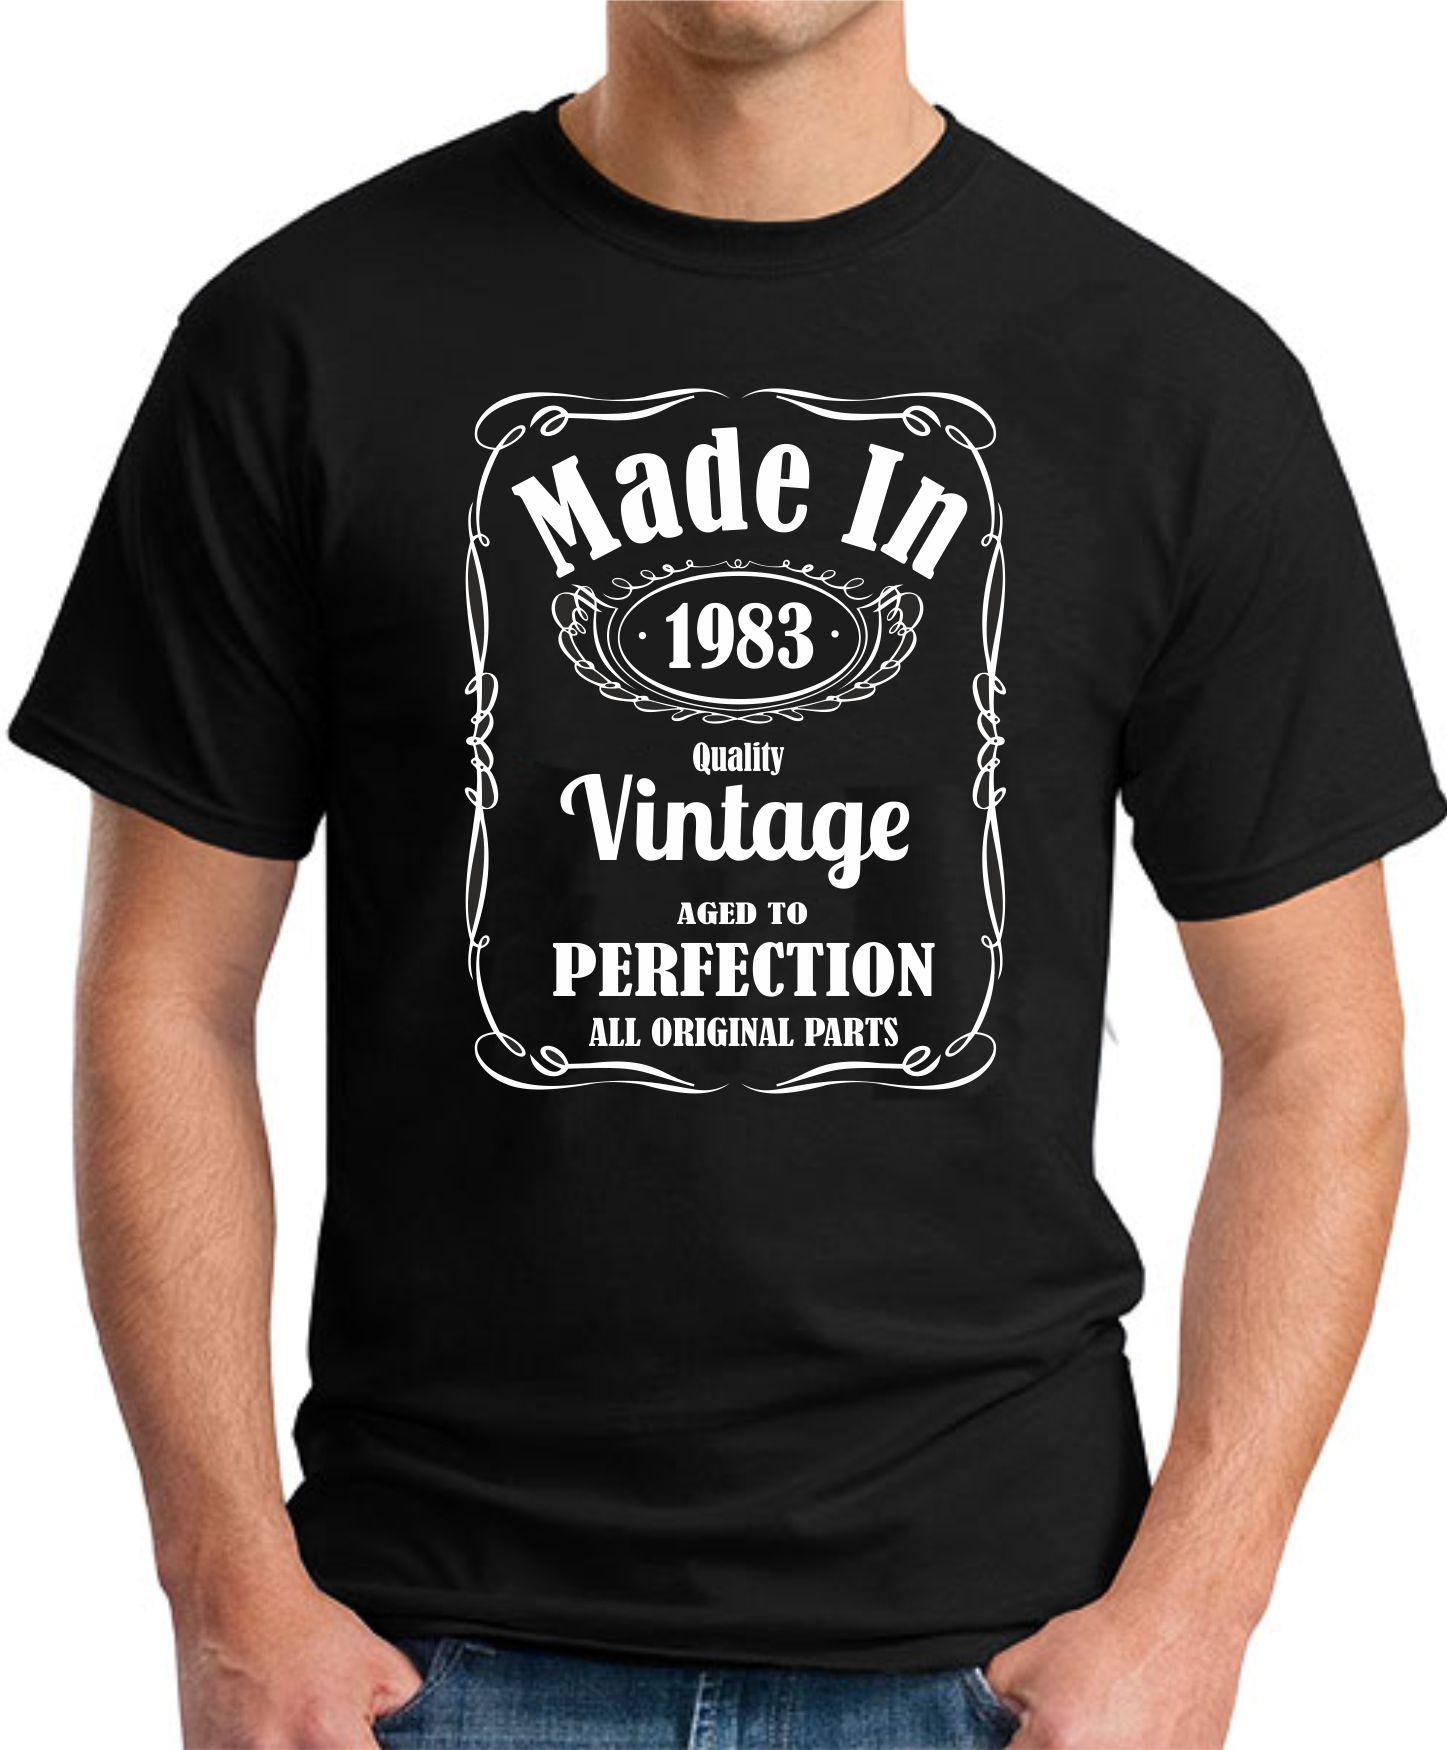 MADE IN 1983 VINTAGE BLACK